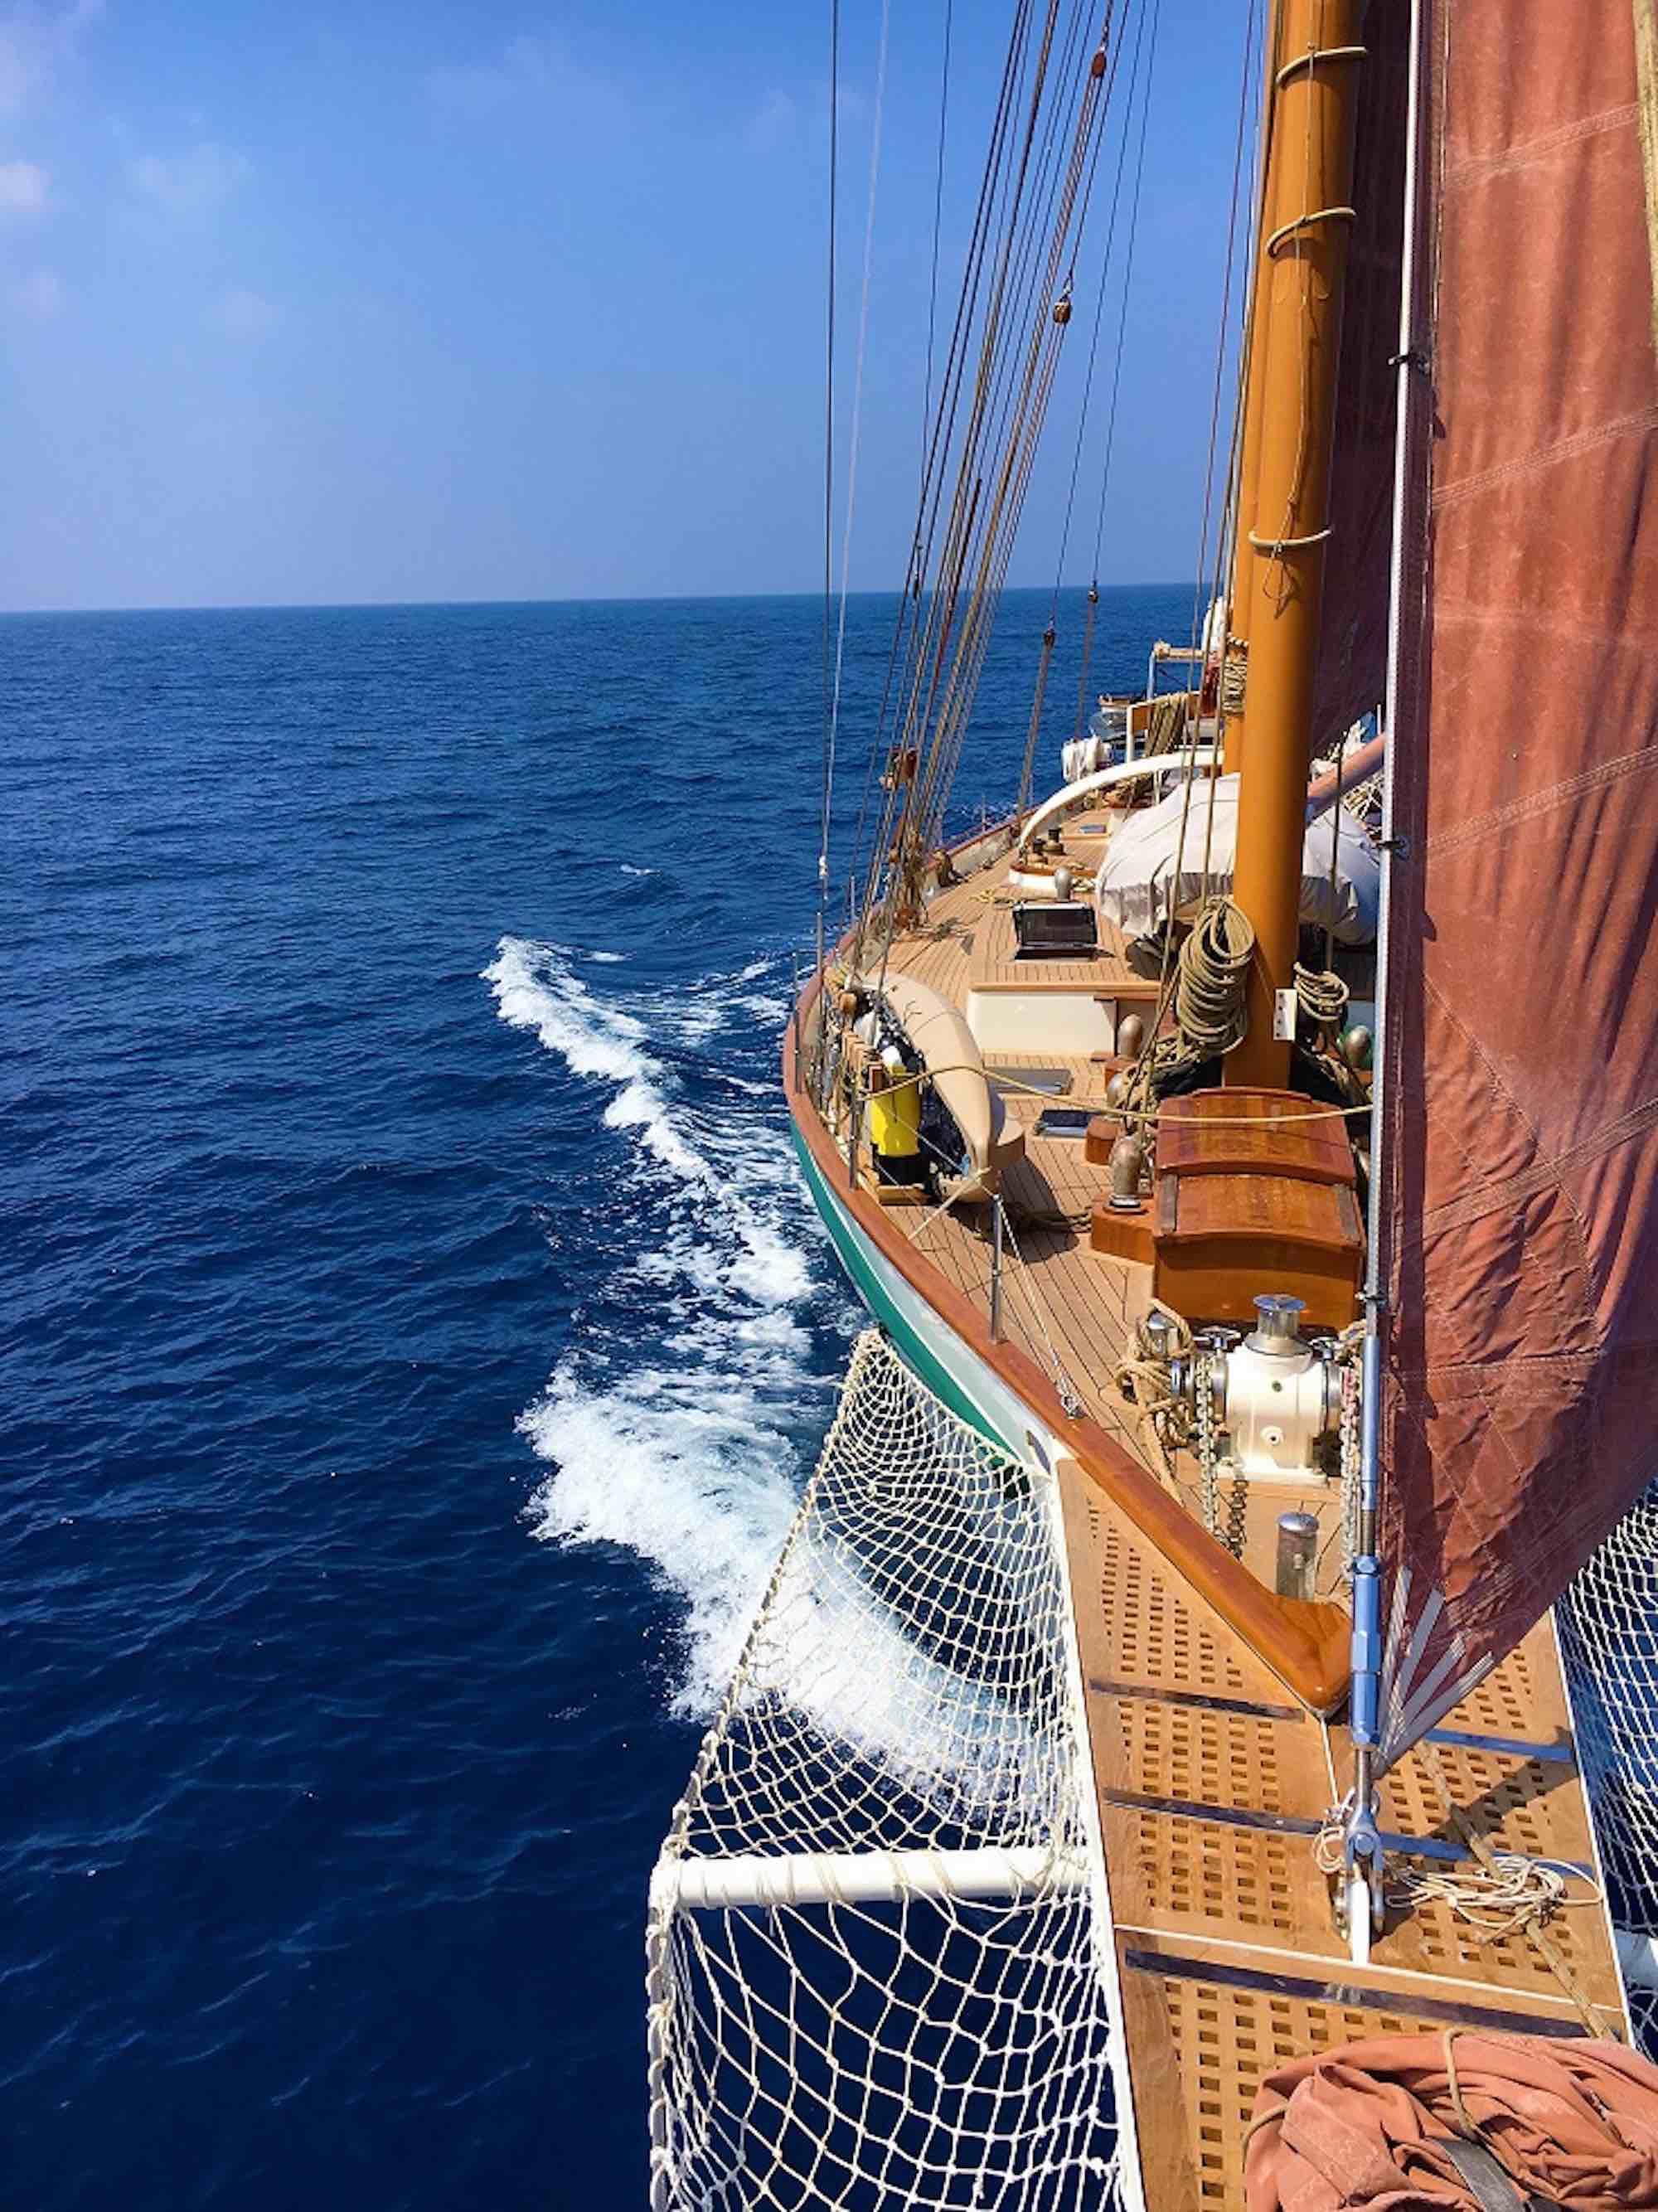 Dallinghoo_bow side sailing on deep blue waters in Mergui Archipelago_XS.jpeg